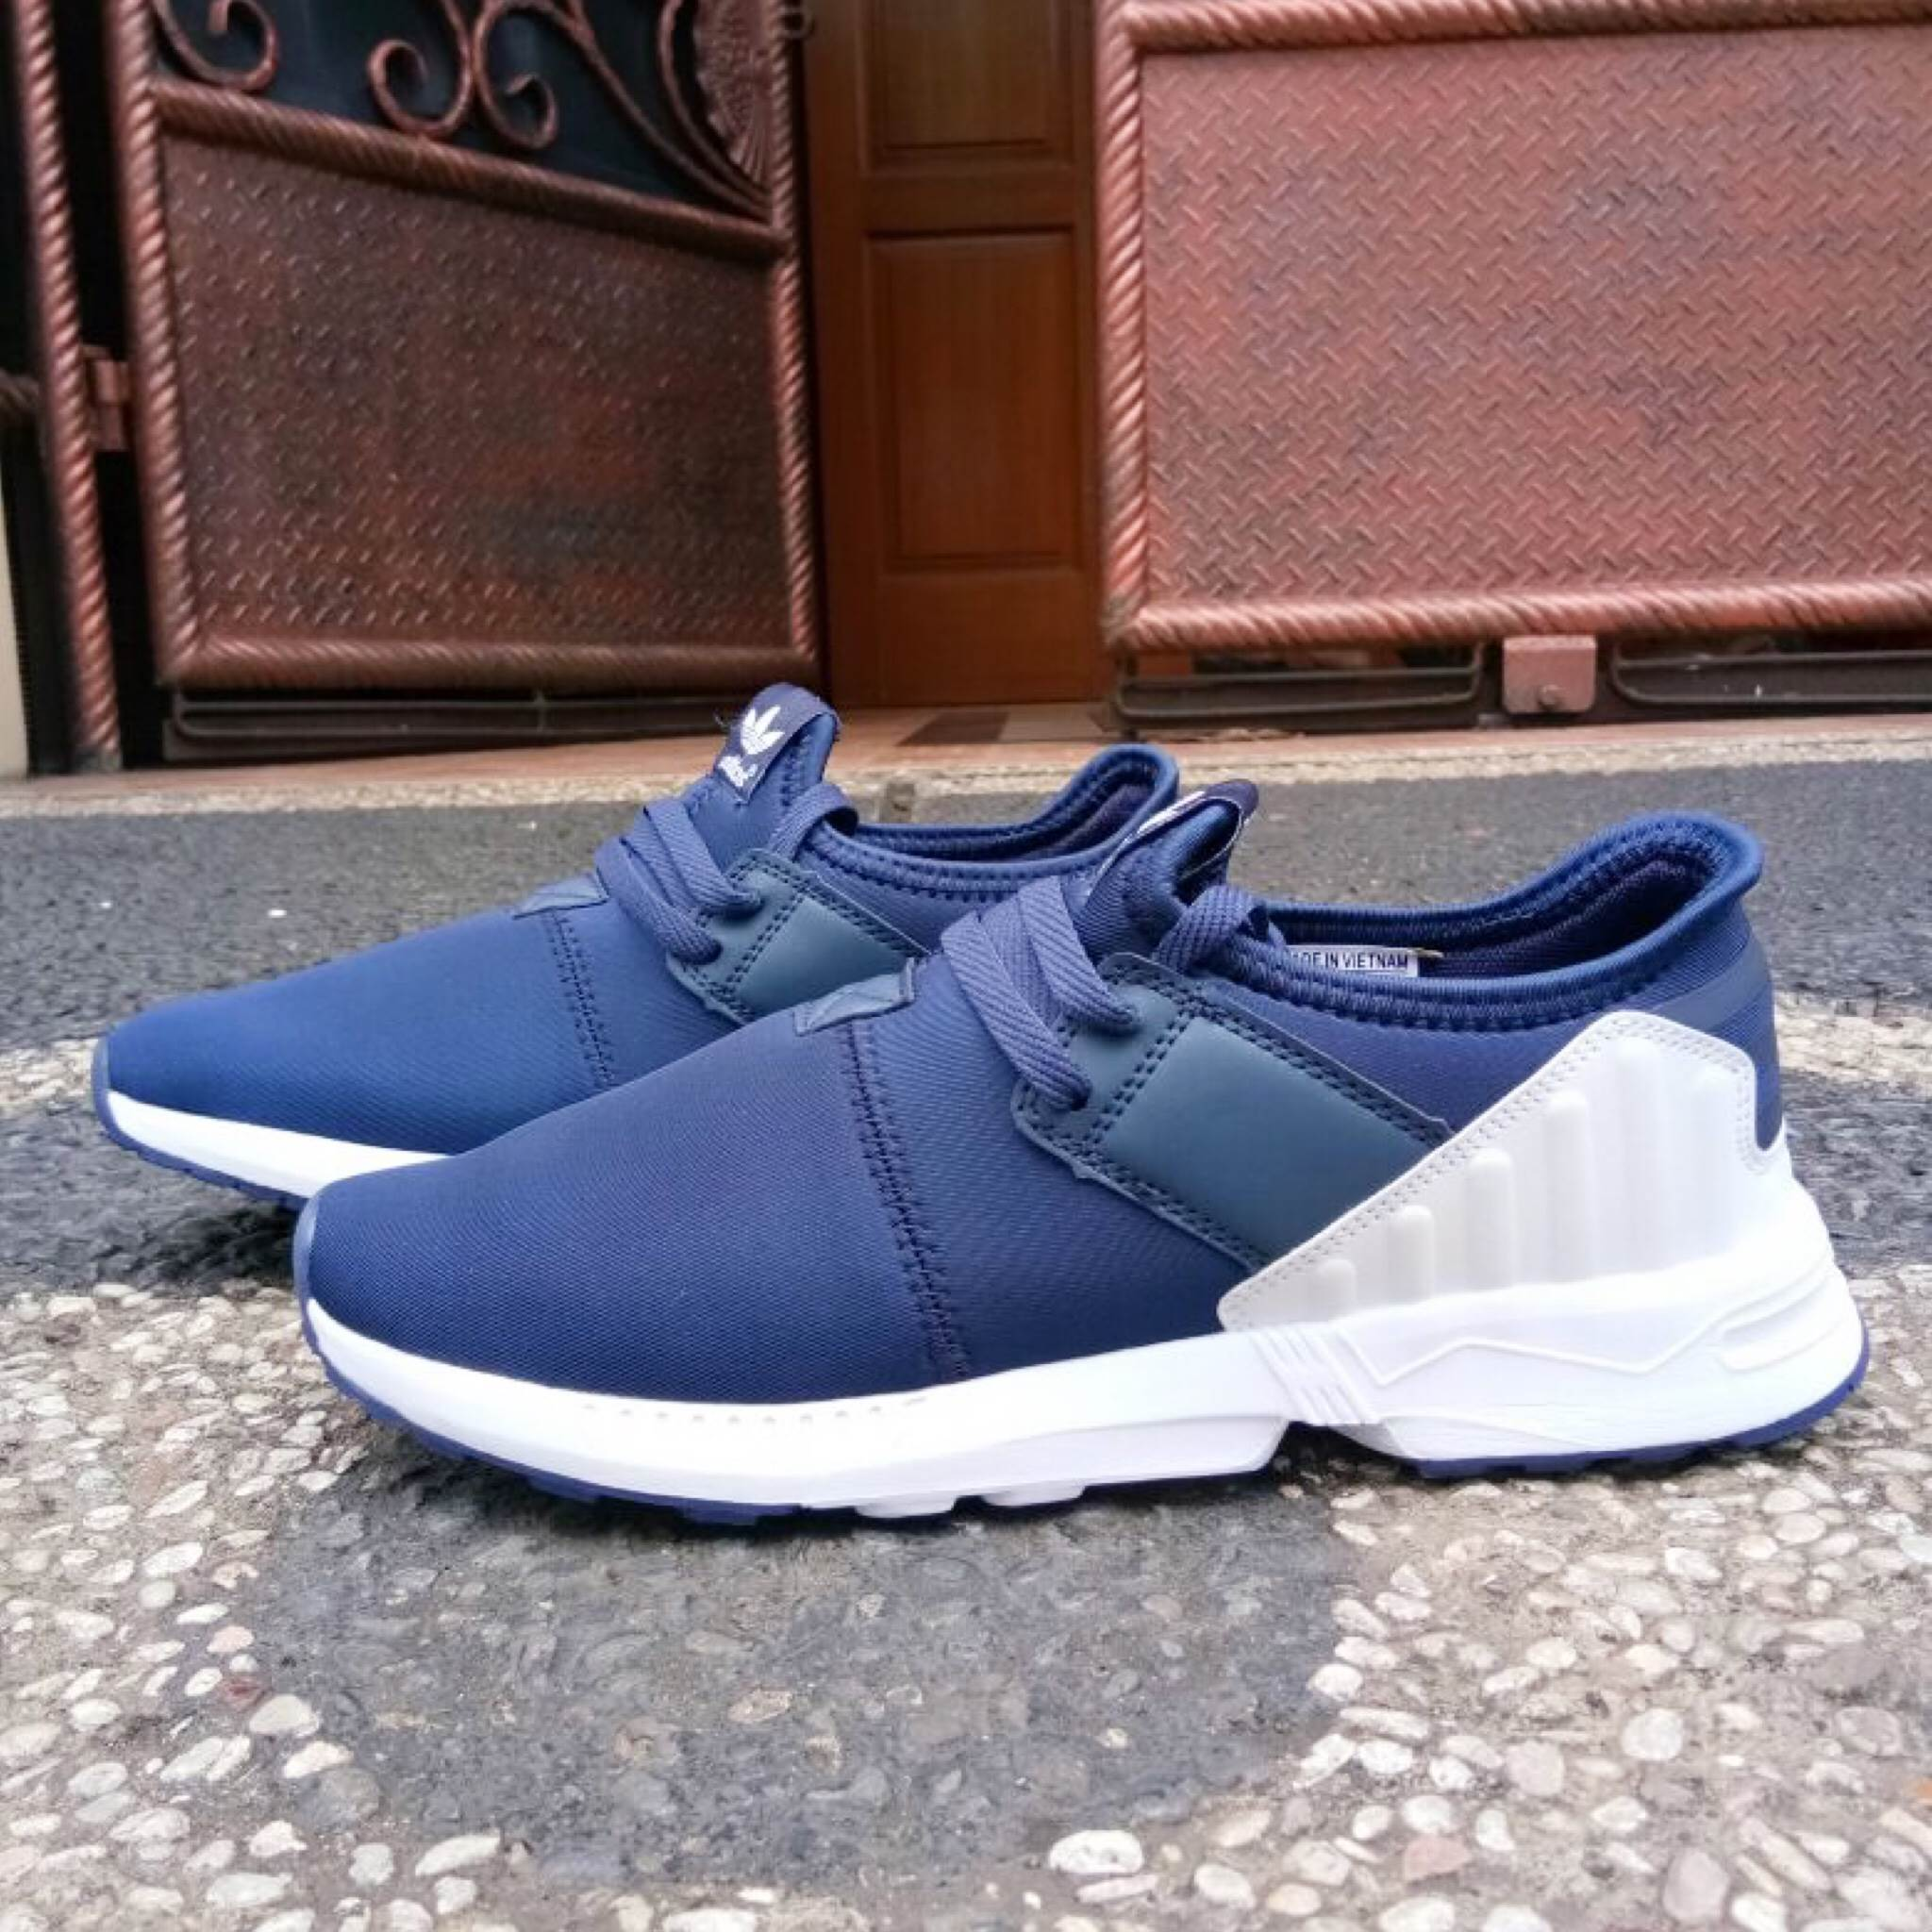 4a1dc88c0 denmark sepatu pria sneakers adidas zx flux plus man grade ori 8db5b 64b93